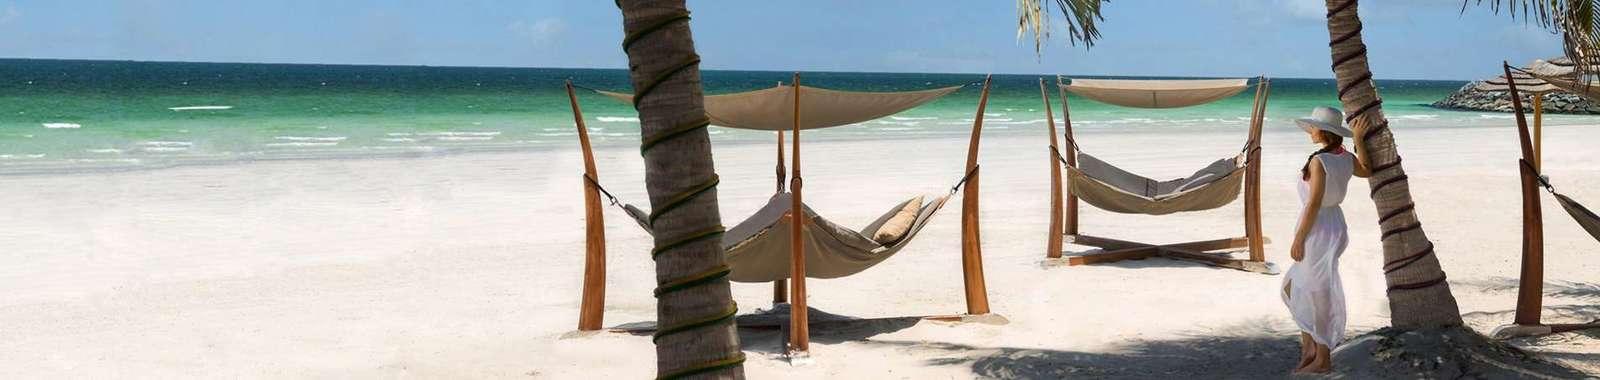 kiqaj_beach_lady-wide